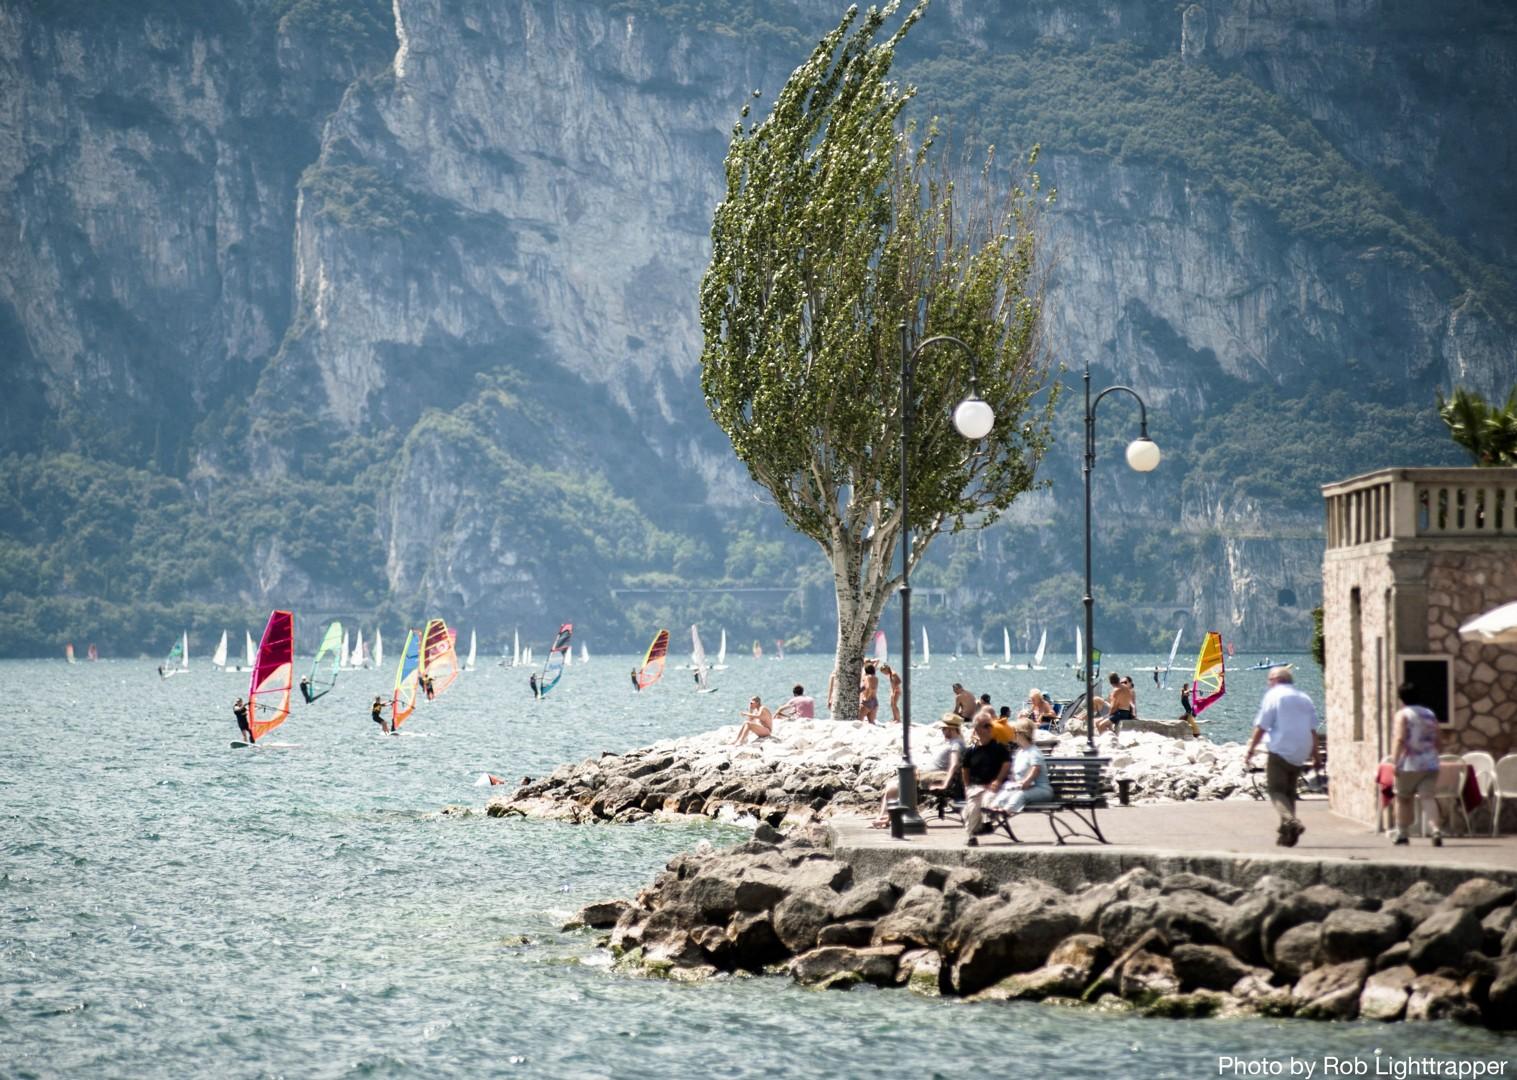 Water-Sports-for-kids-on-lake-garda-Family-Cycling-Holiday-Lake-Garda-Venice-Italy.jpg - Italy - Lake Garda to Venice - Self-Guided Family Cycling Holiday - Italia Leisure and Family Cycling